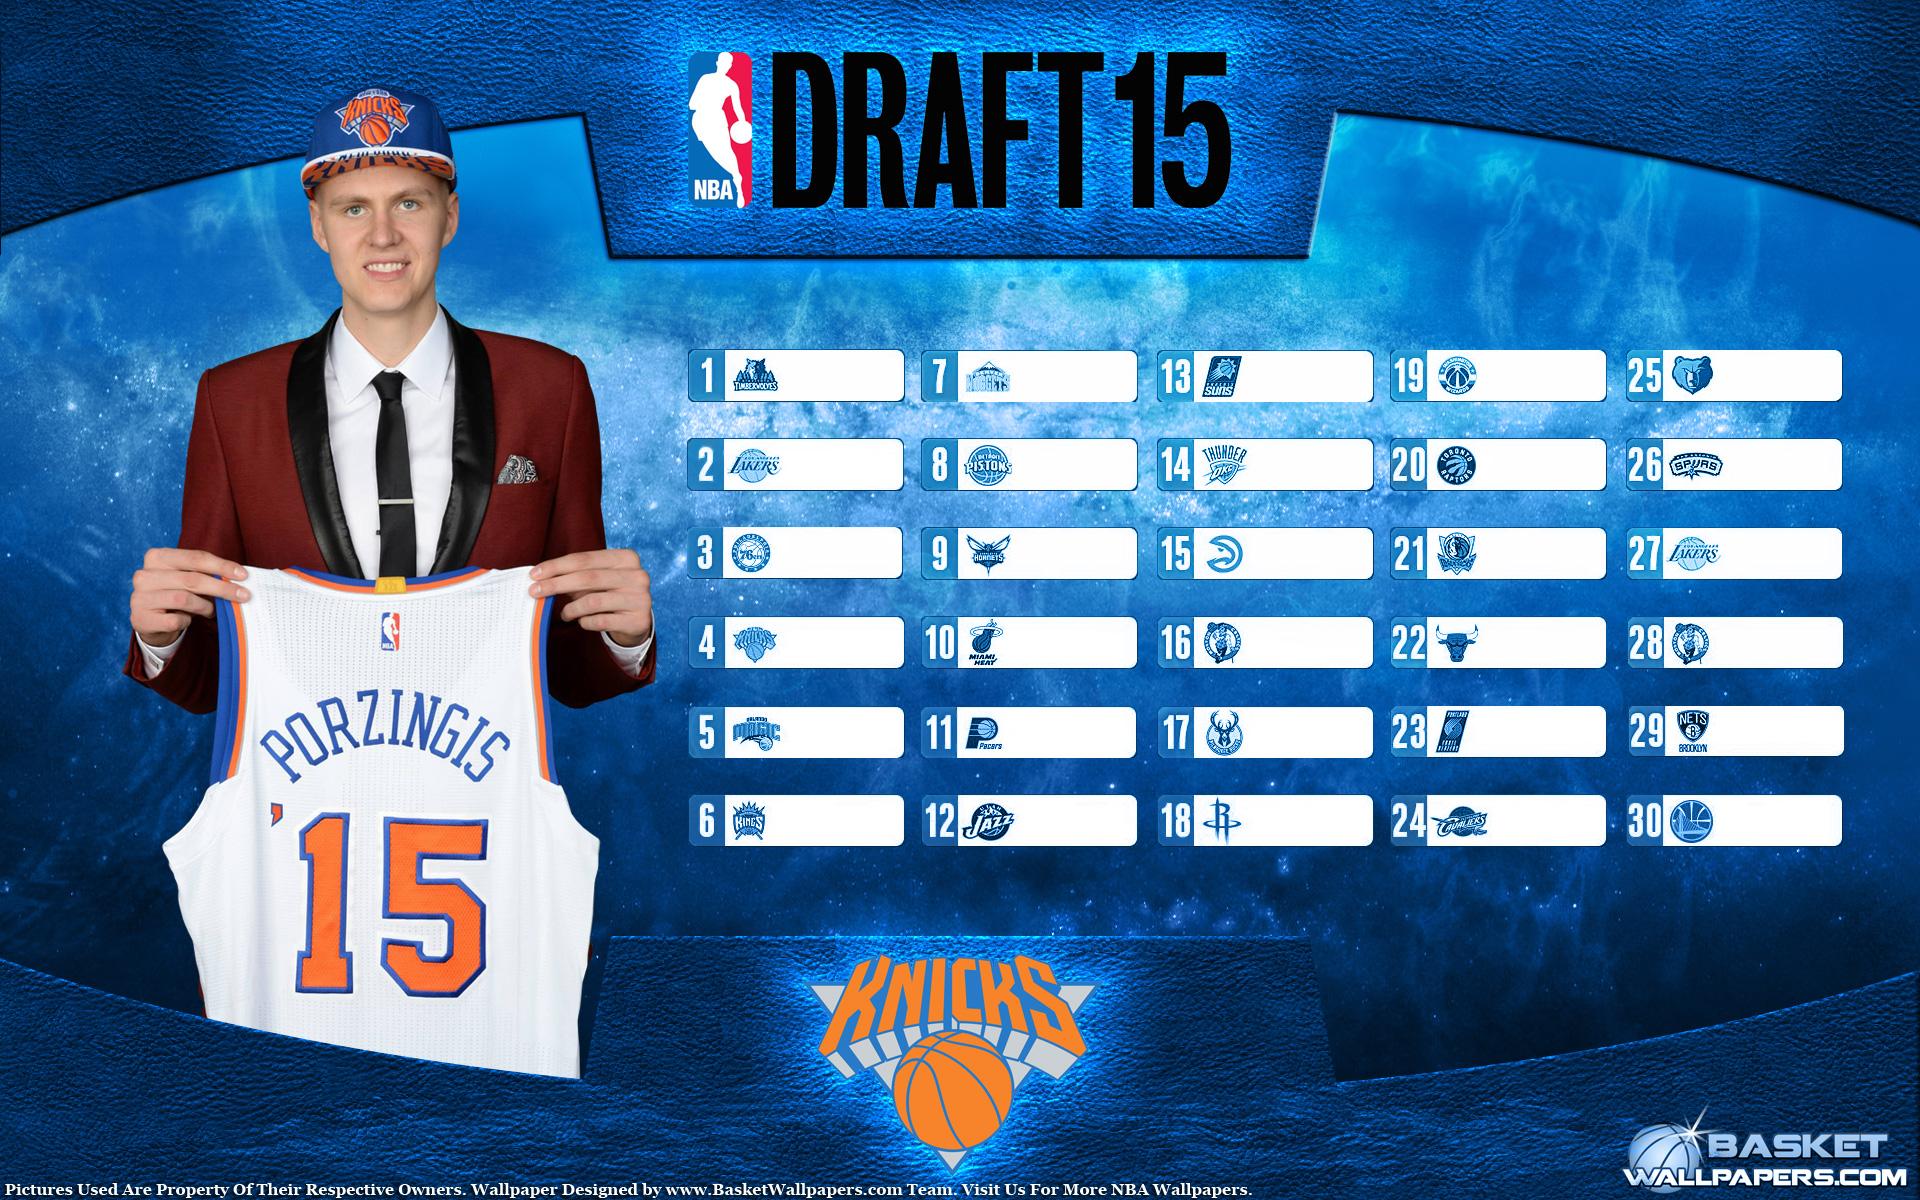 Kristaps Porzingis Knicks 2015 NBA Draft Wallpaper Basketball 1920x1200